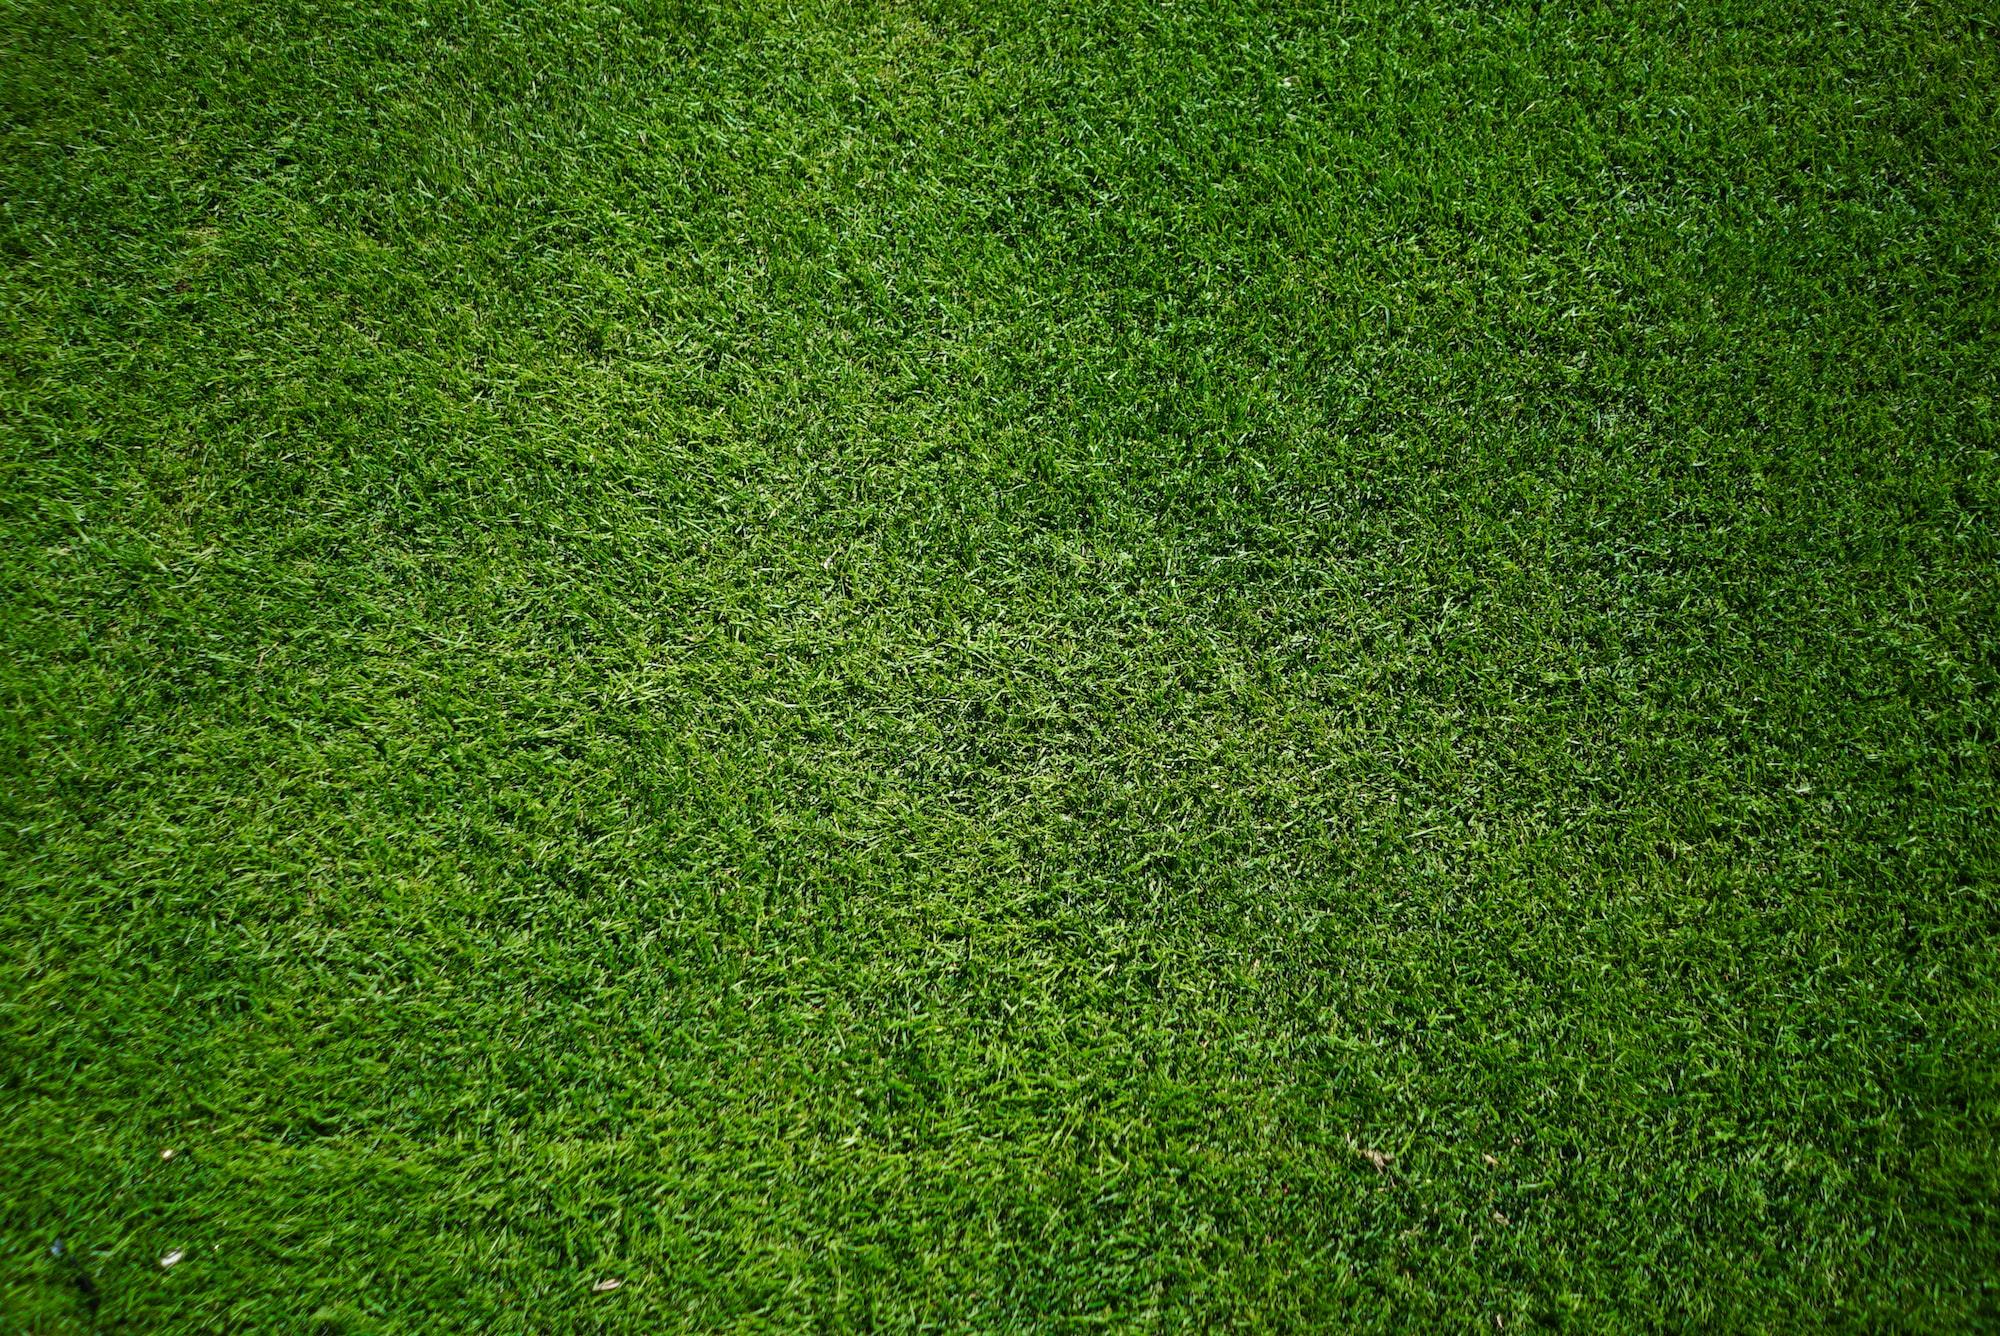 Grass Simulatorレビュー